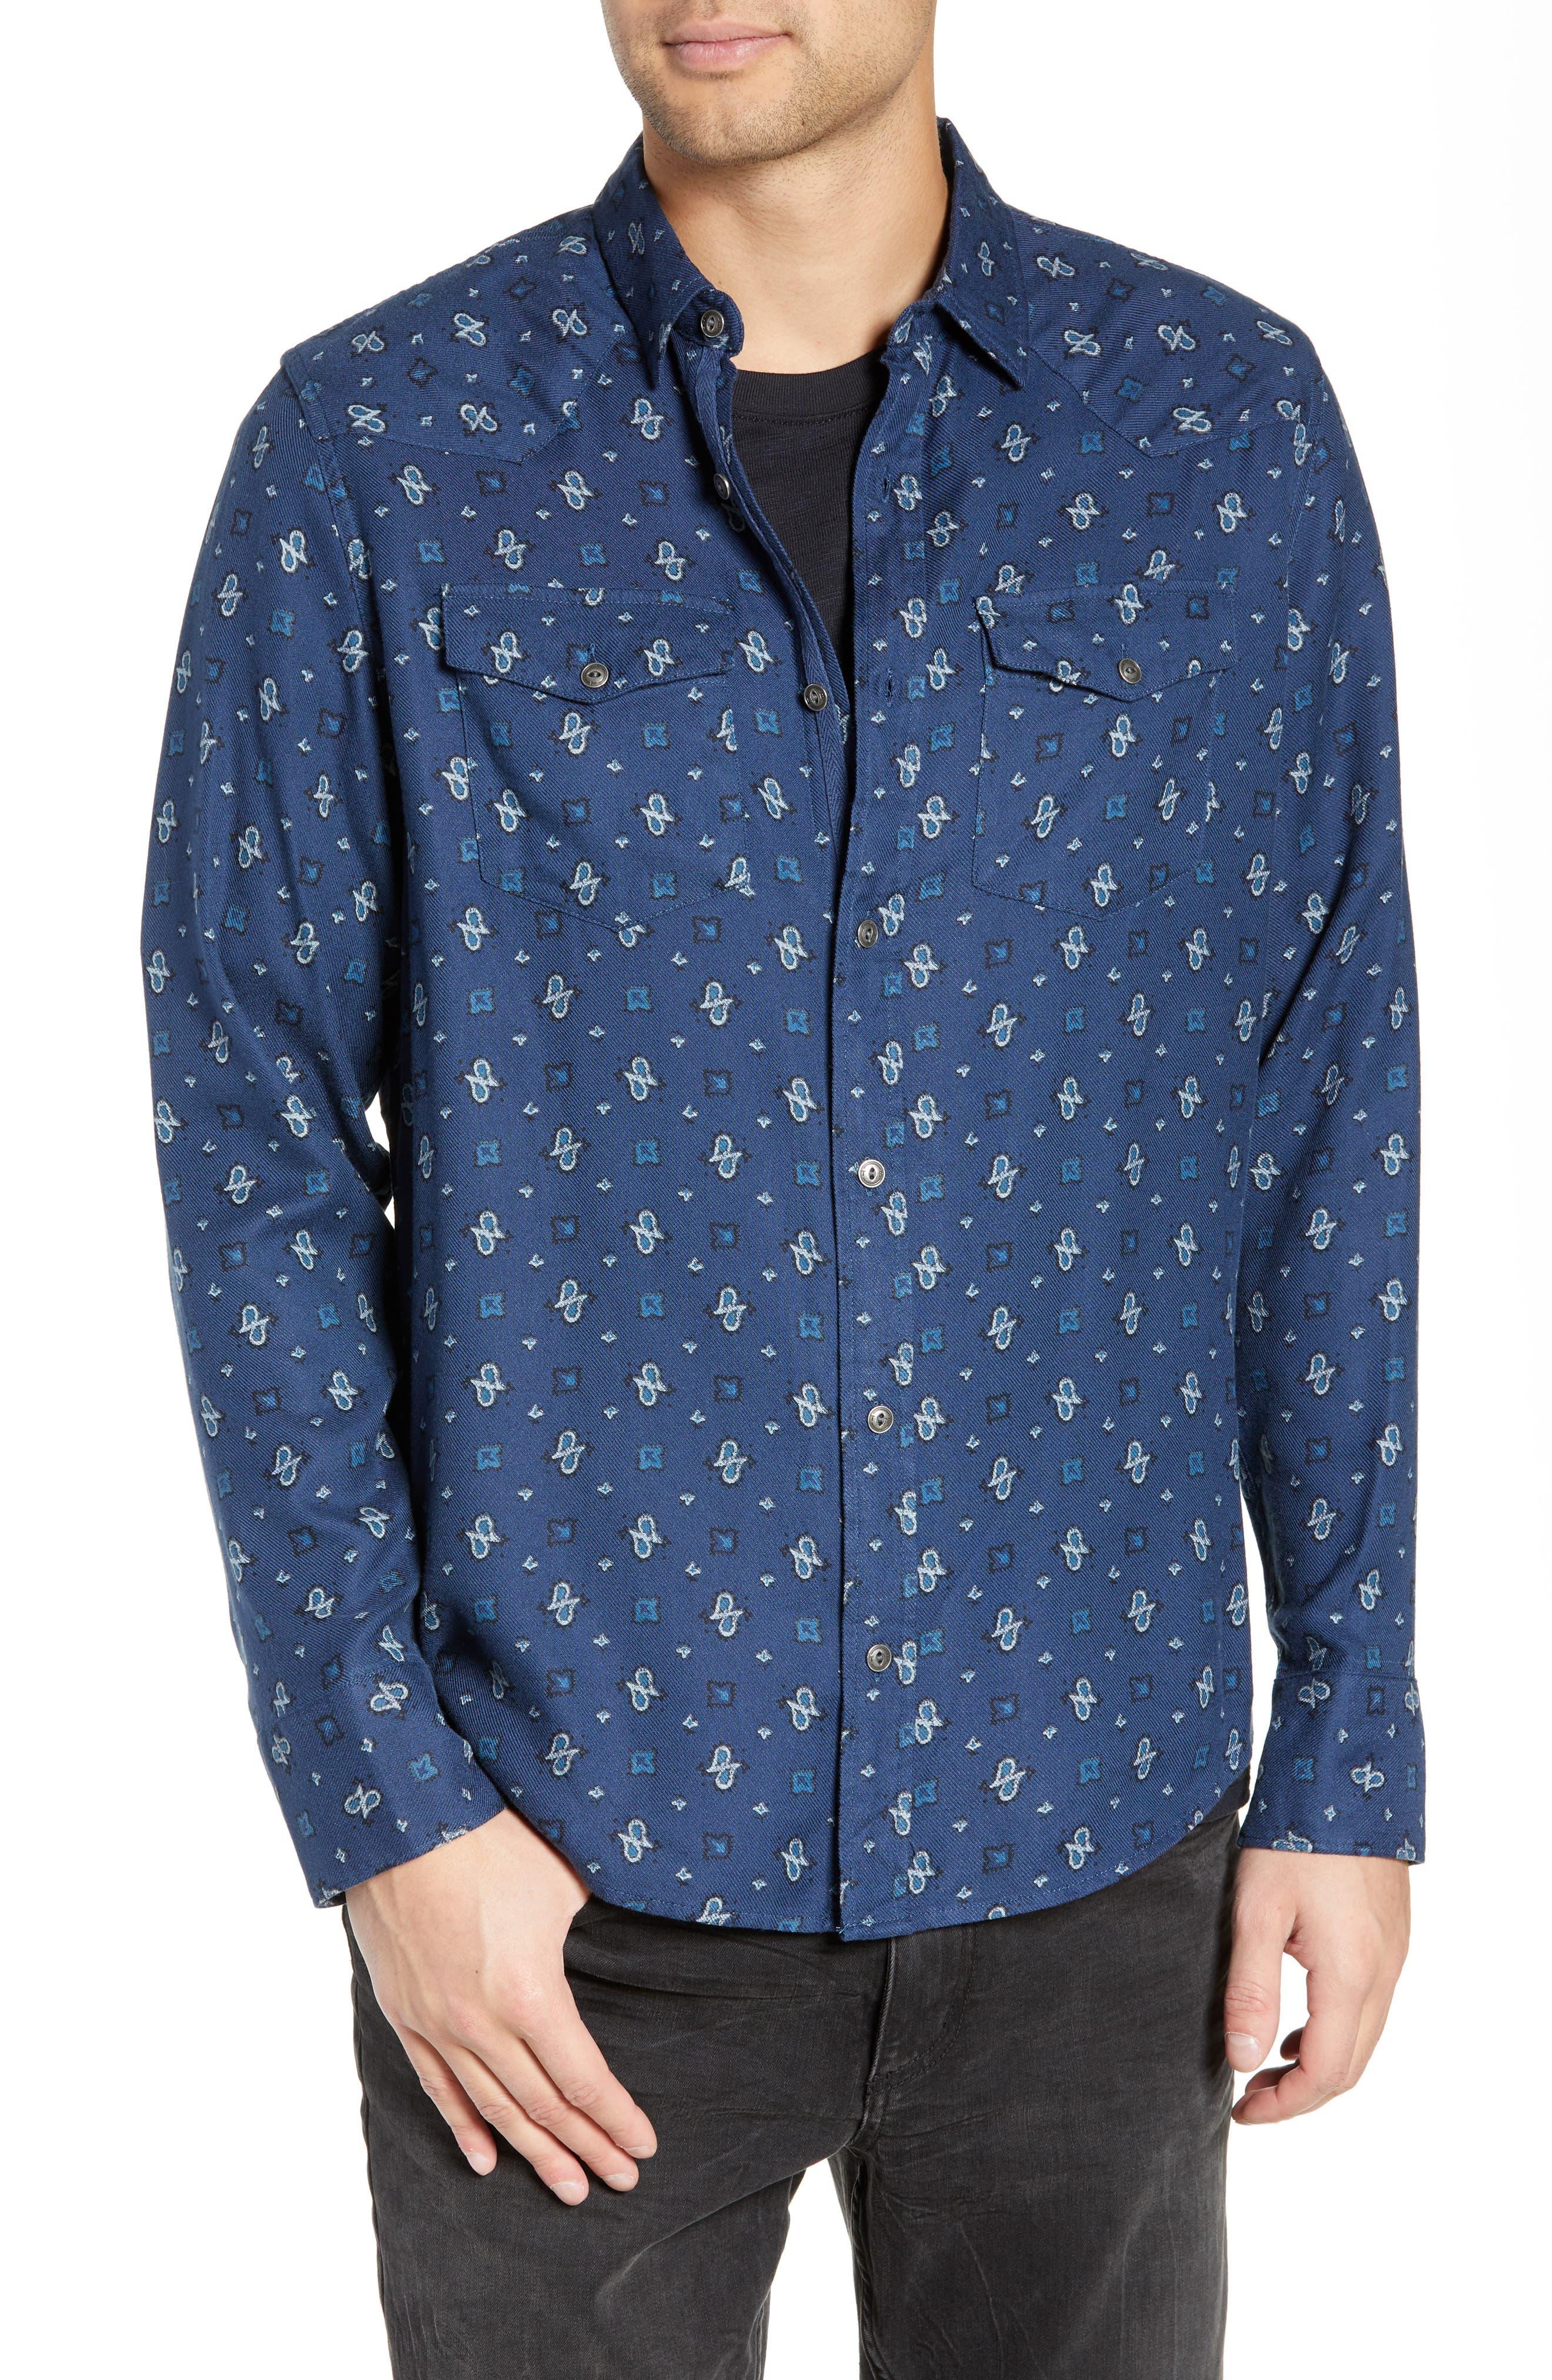 Regular Fit Paisley Western Shirt,                             Main thumbnail 1, color,                             BLUE CASPIA DESERT PAISLEY